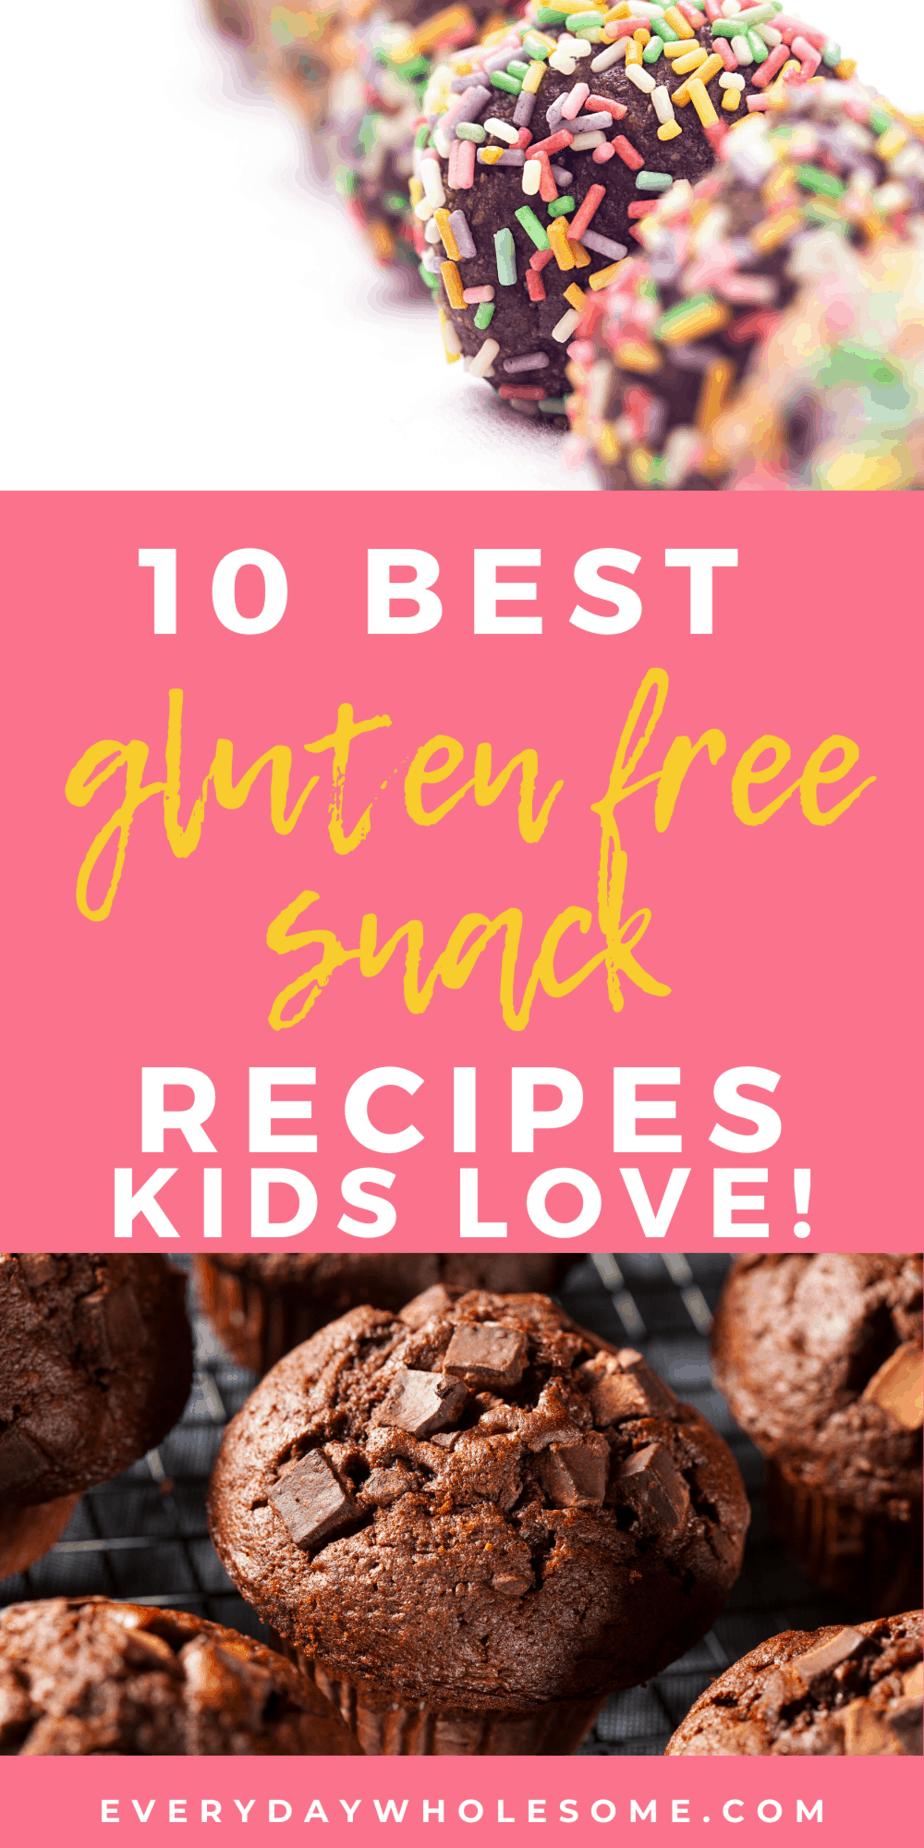 10 best gluten free snack recipes kids love